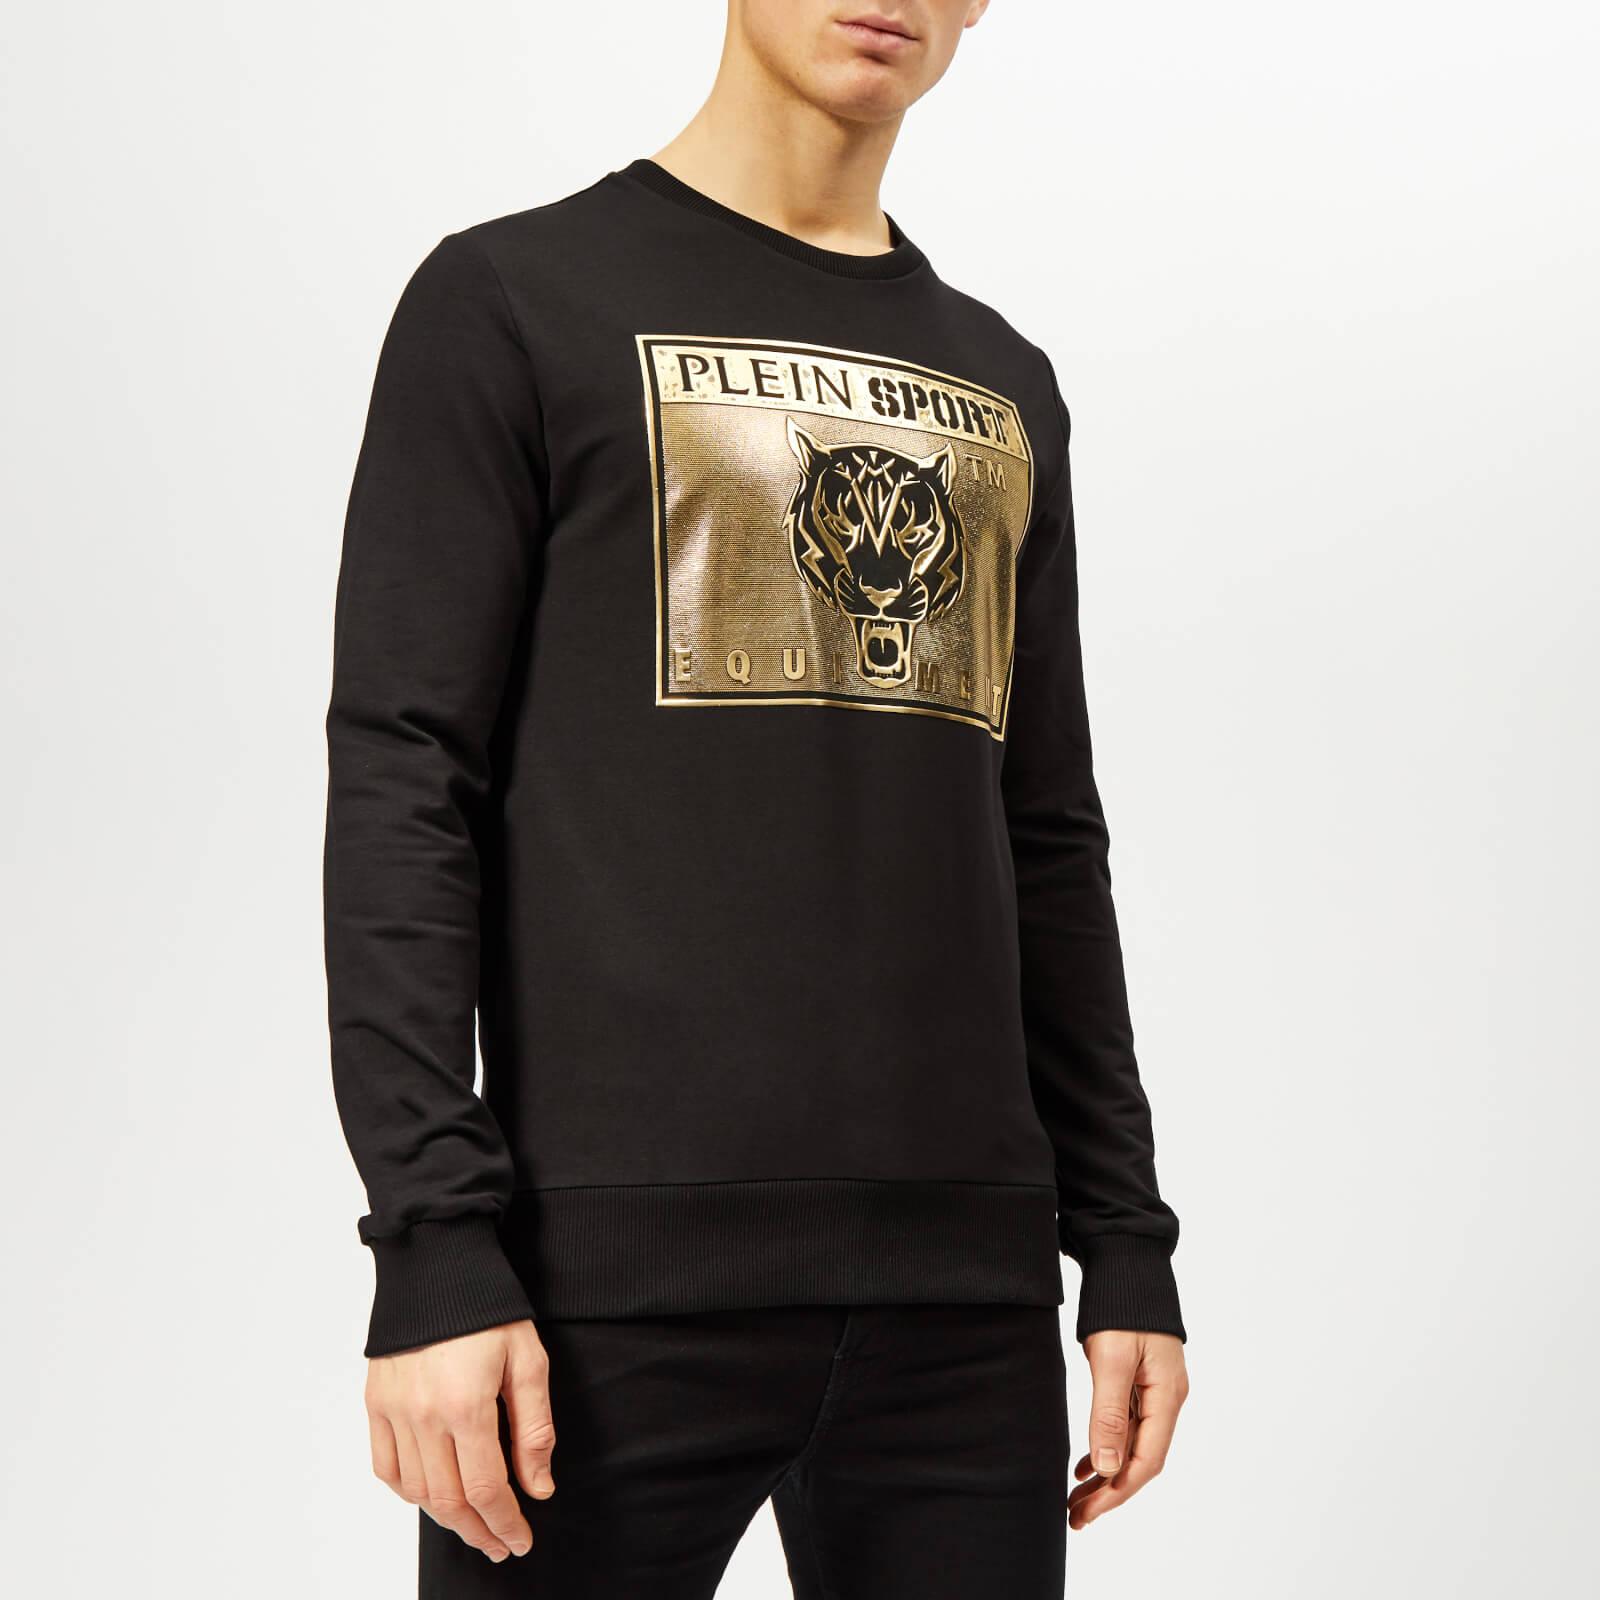 Plein Sport Men's Metal Sport Sweatshirt - Black/Gold - XXL - Black/Gold